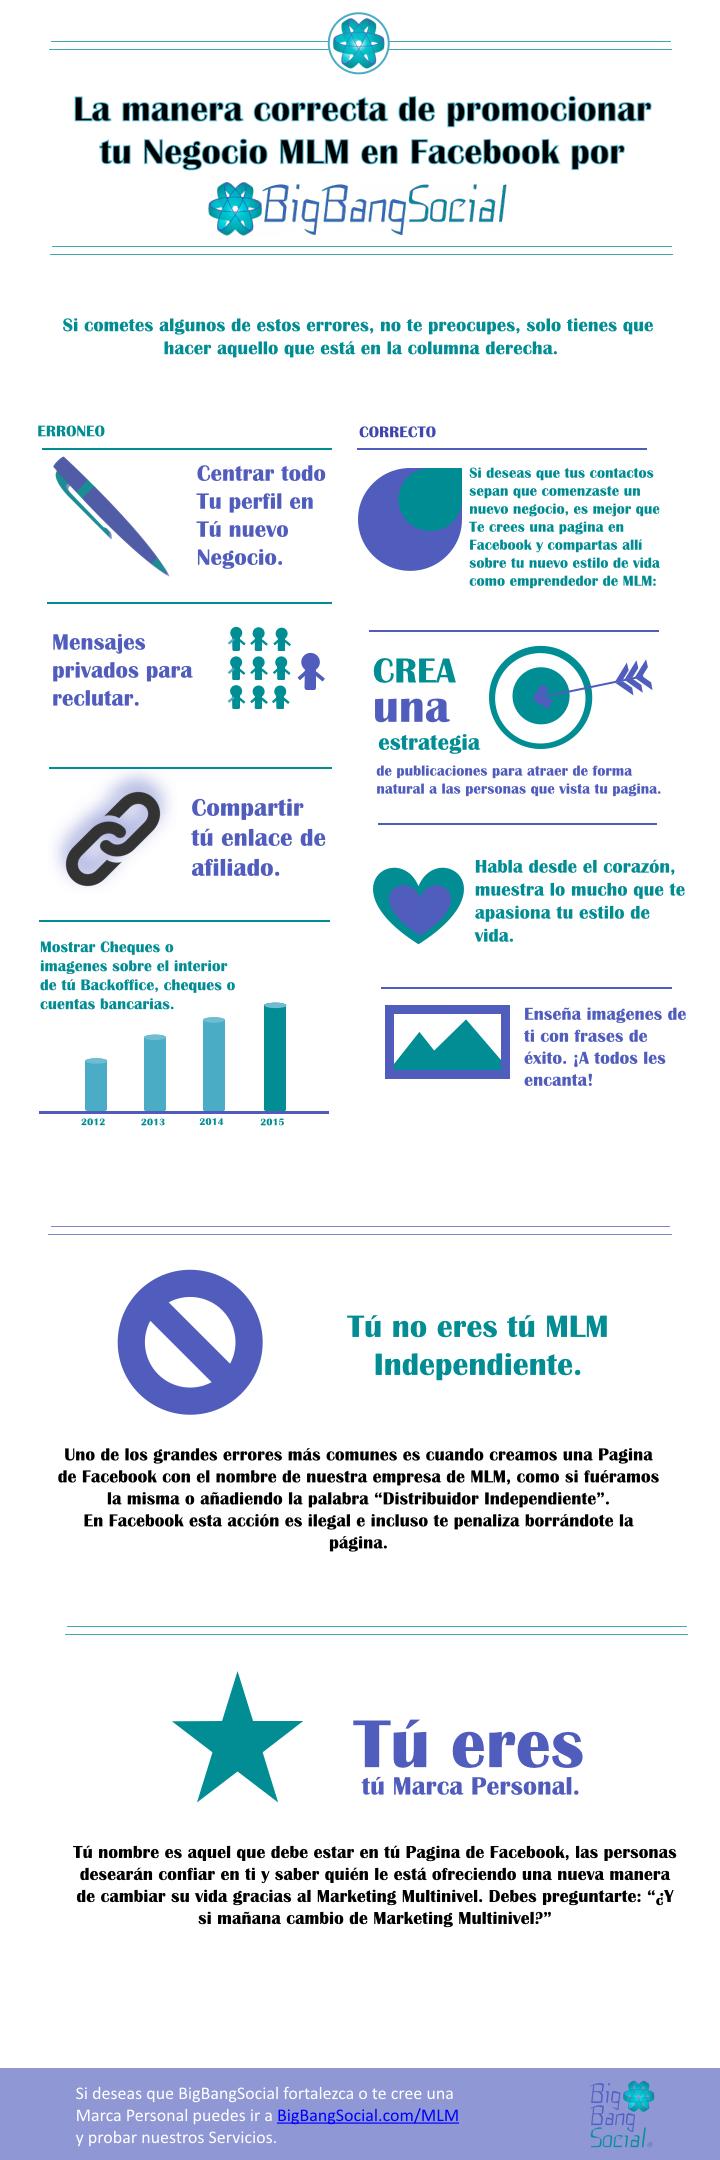 Infografia-errores-en-la-Marca-Personal.001